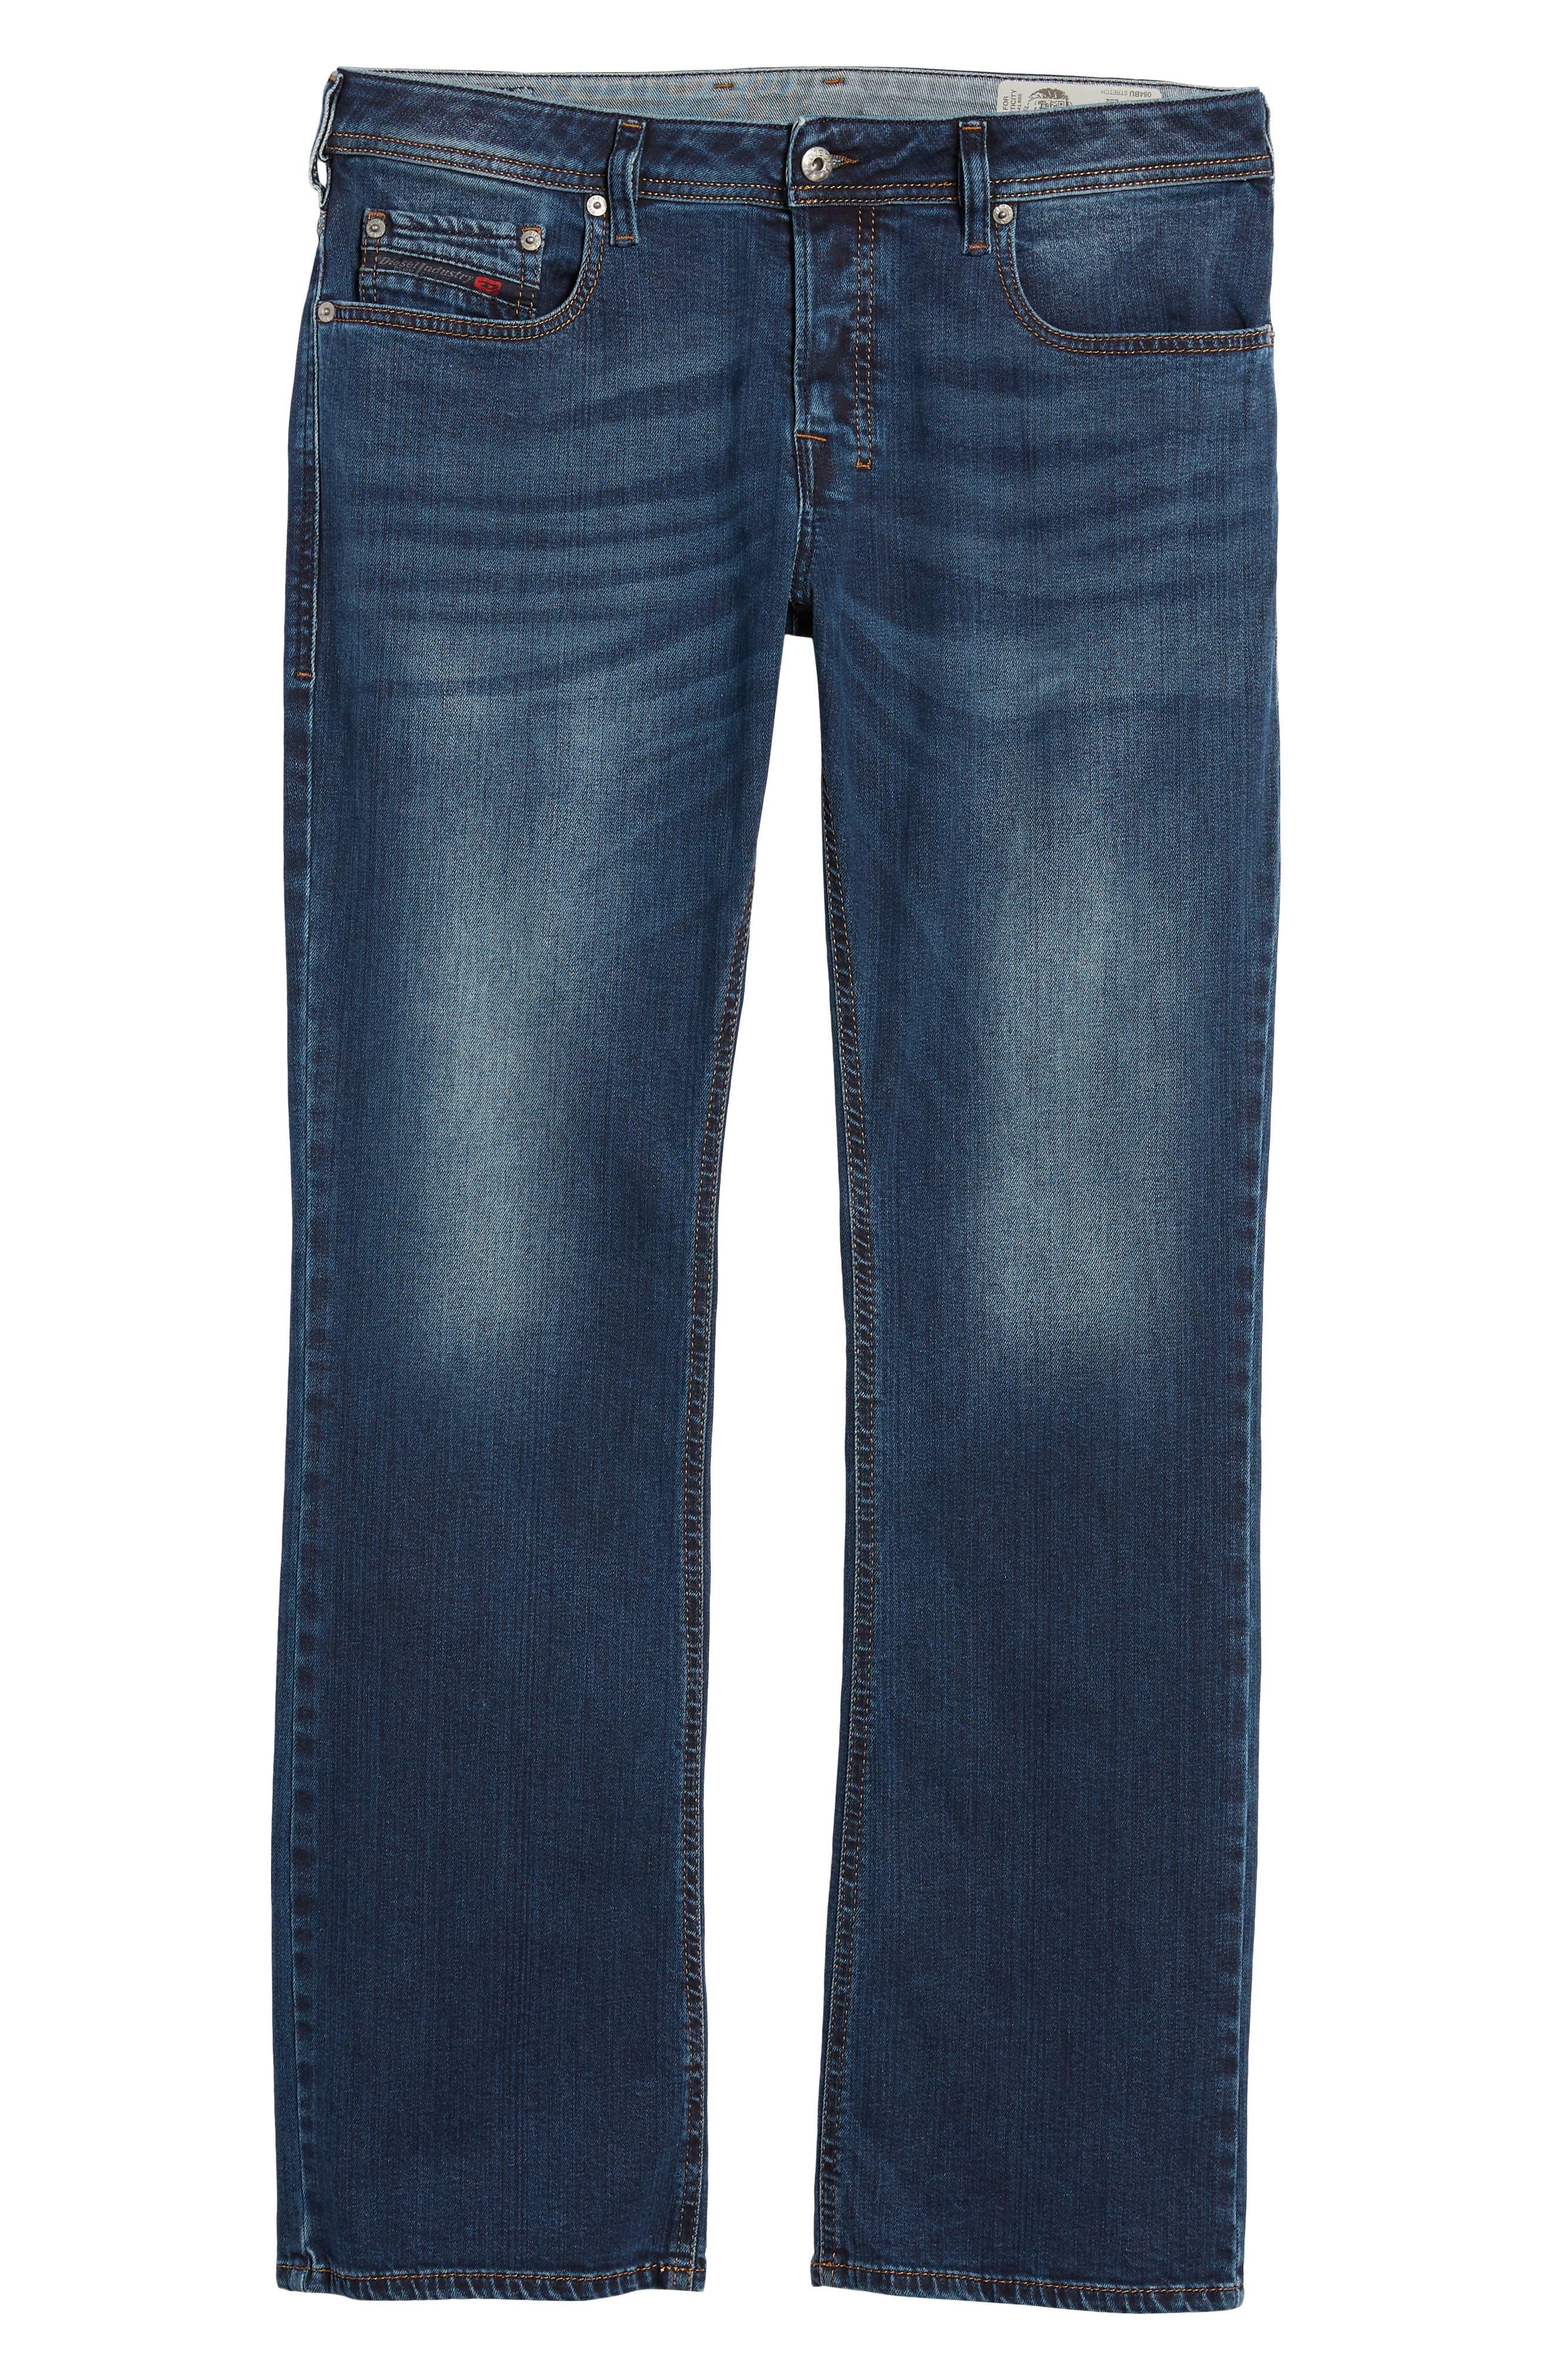 Zatiny Bootcut Jeans,                             Alternate thumbnail 6, color,                             084BU